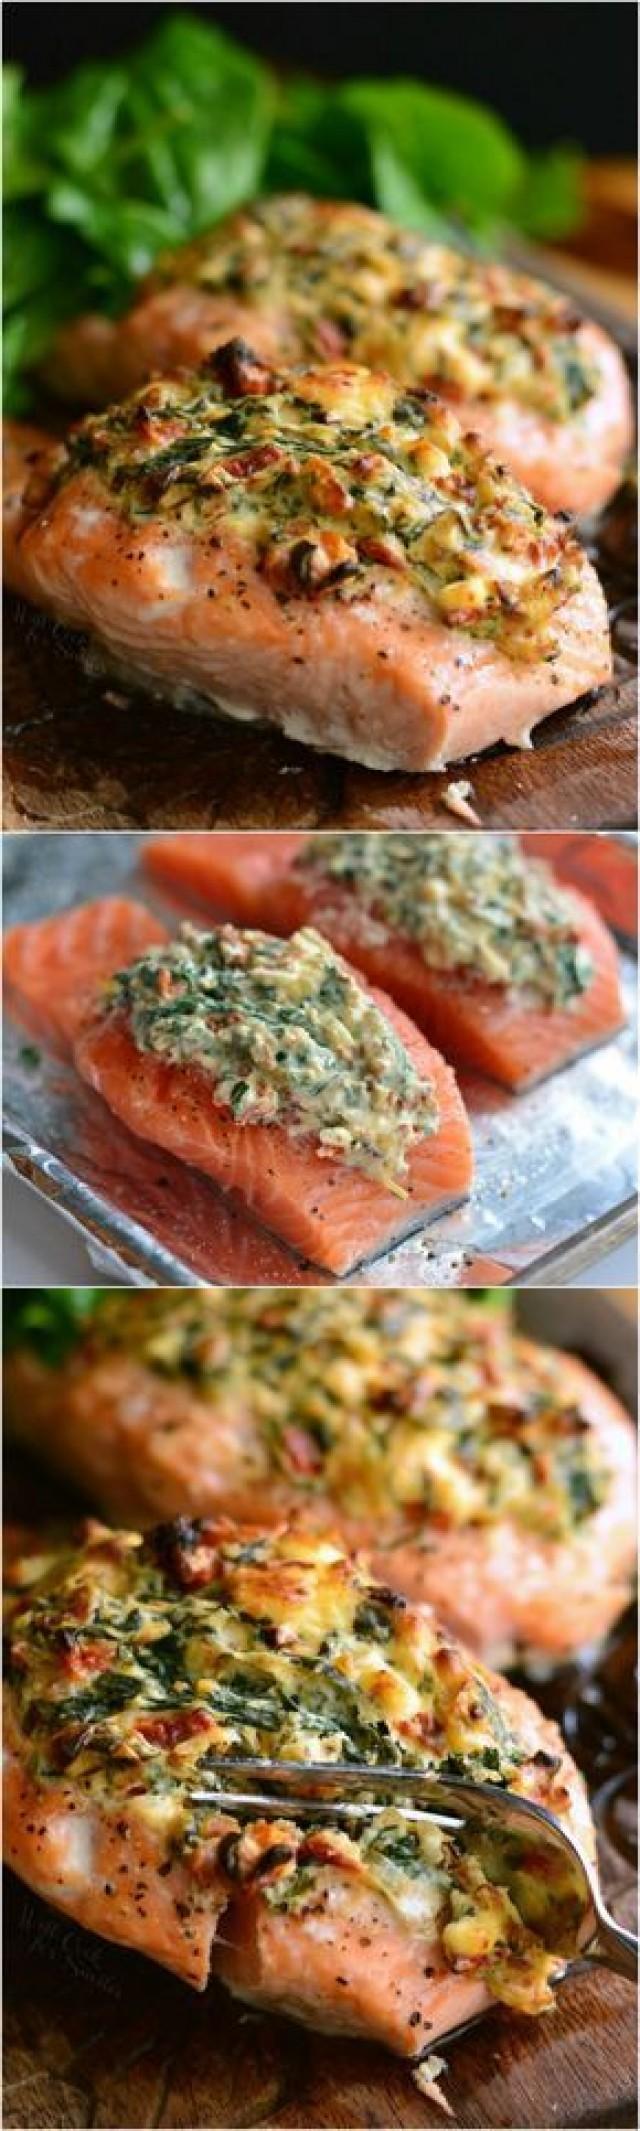 Creamy Spinach And Sun-Dried Tomato-Stuffed Salmon